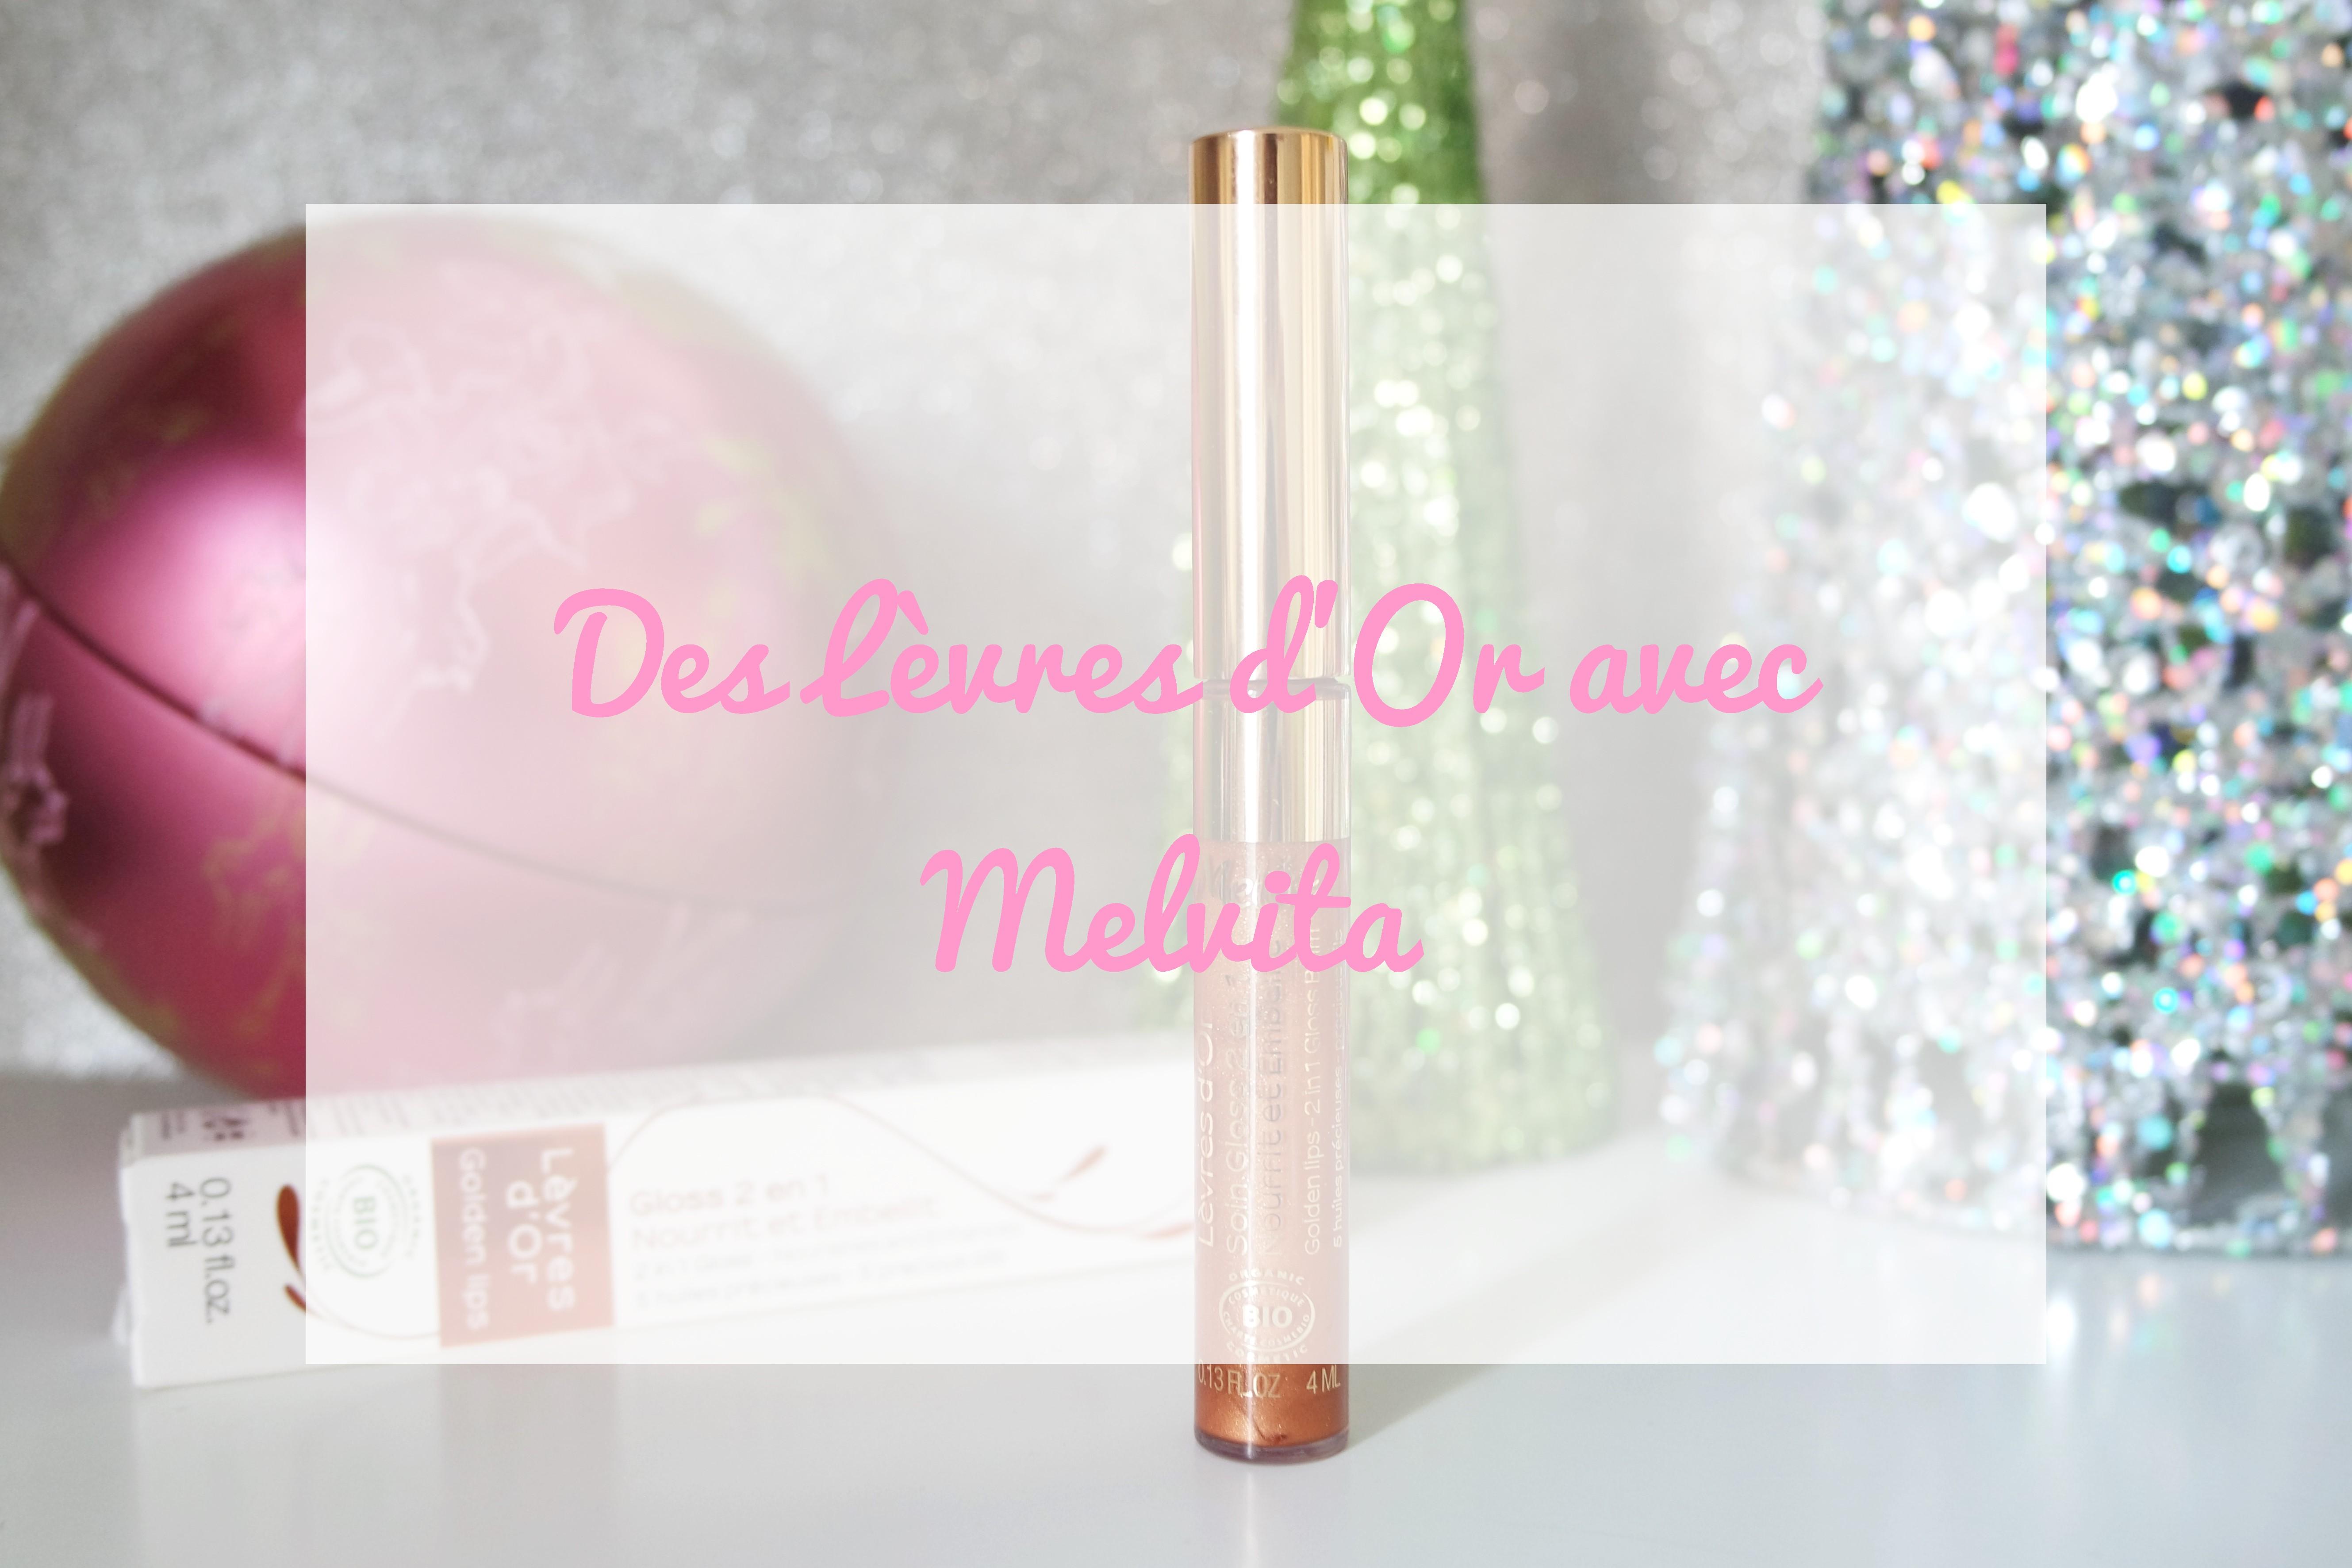 melvita gloss lèvres d'or